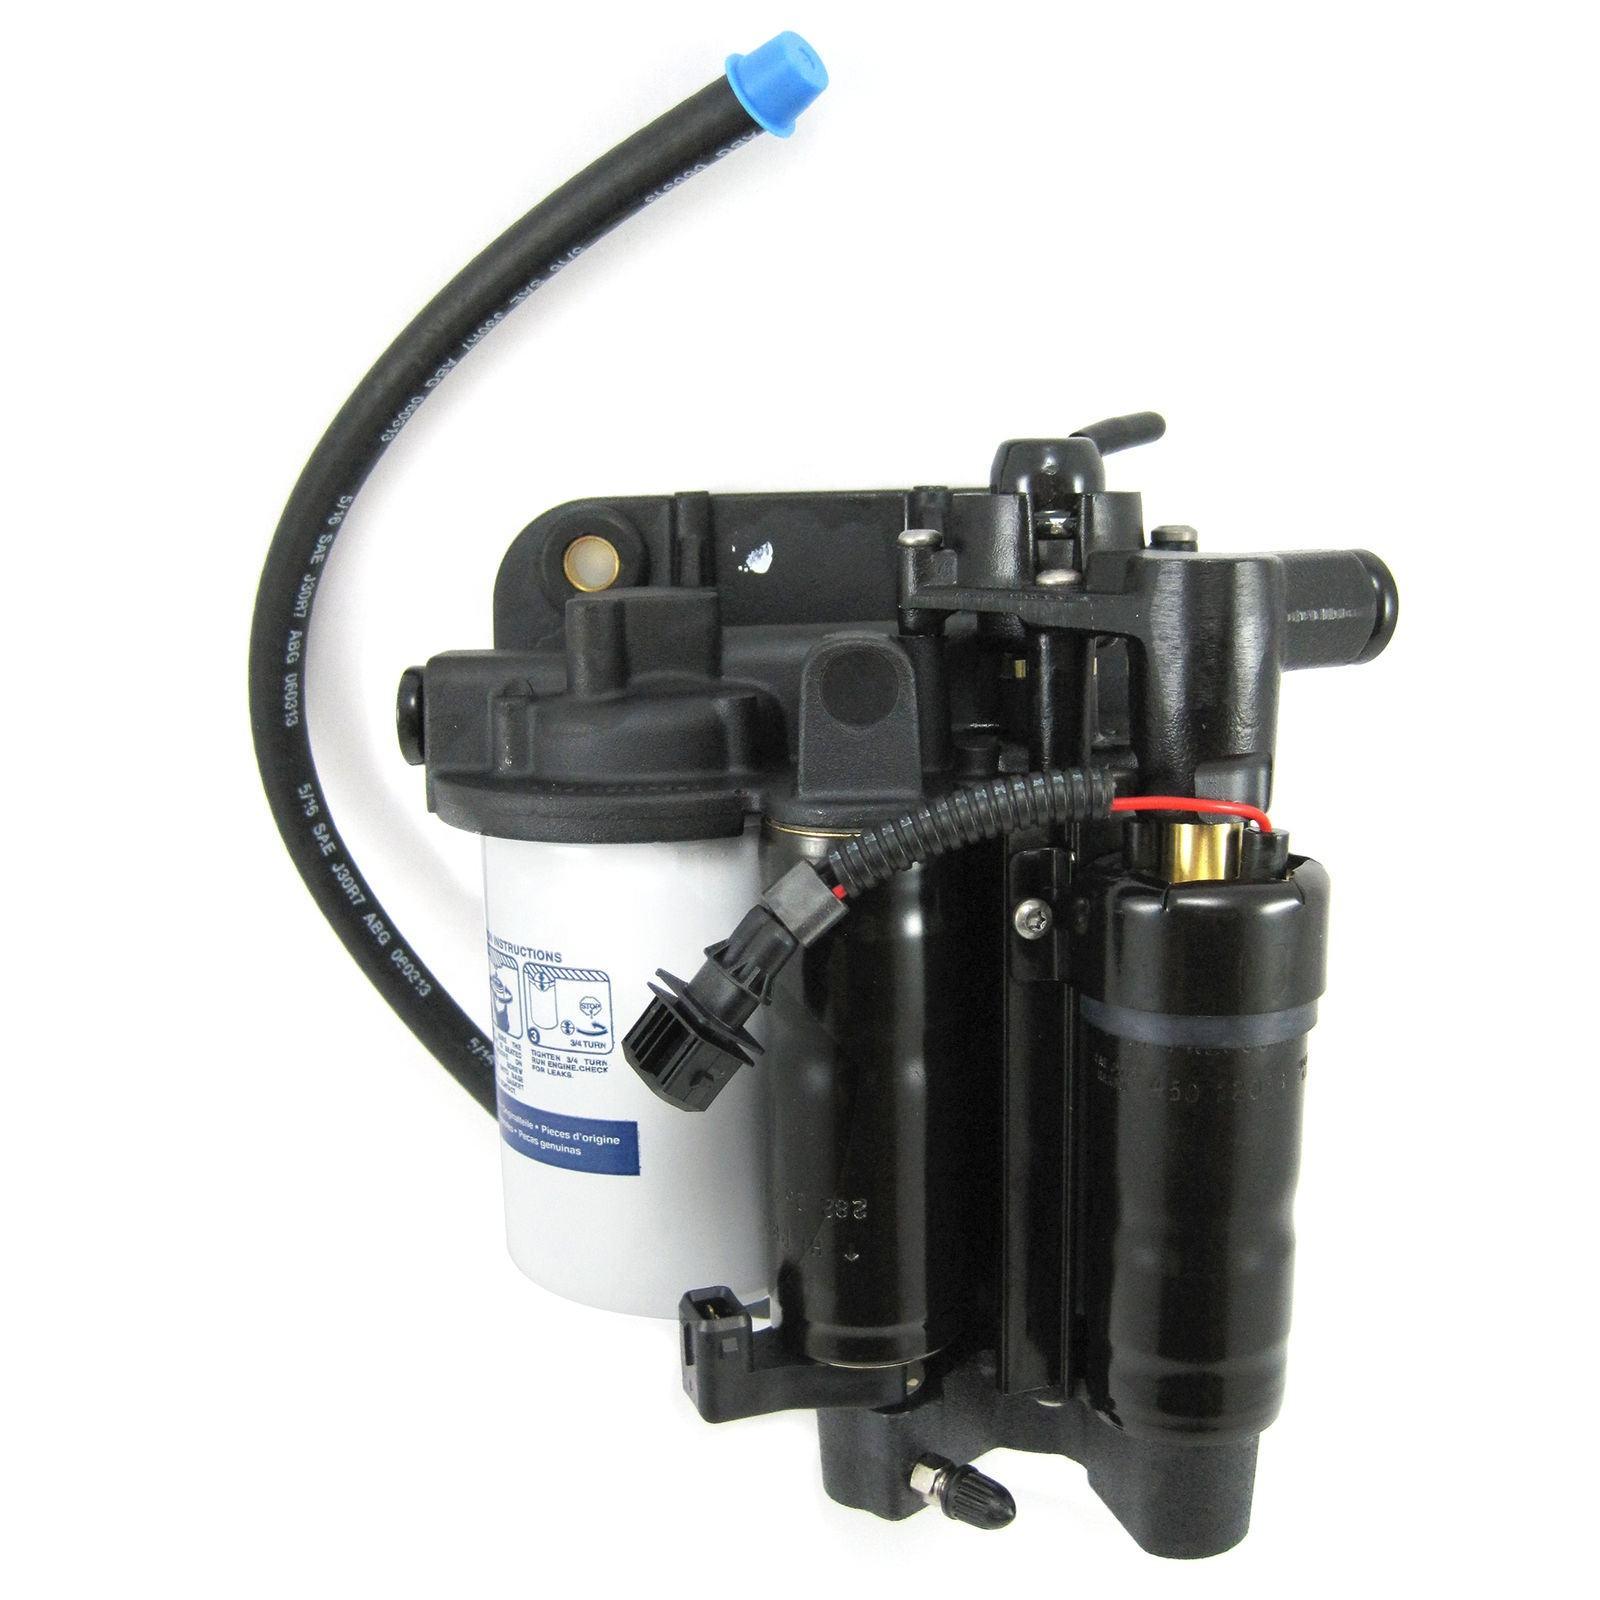 Kraftstoffpumpe Benzinpumpe für Volvo Penta 21608512 8.1L Motor